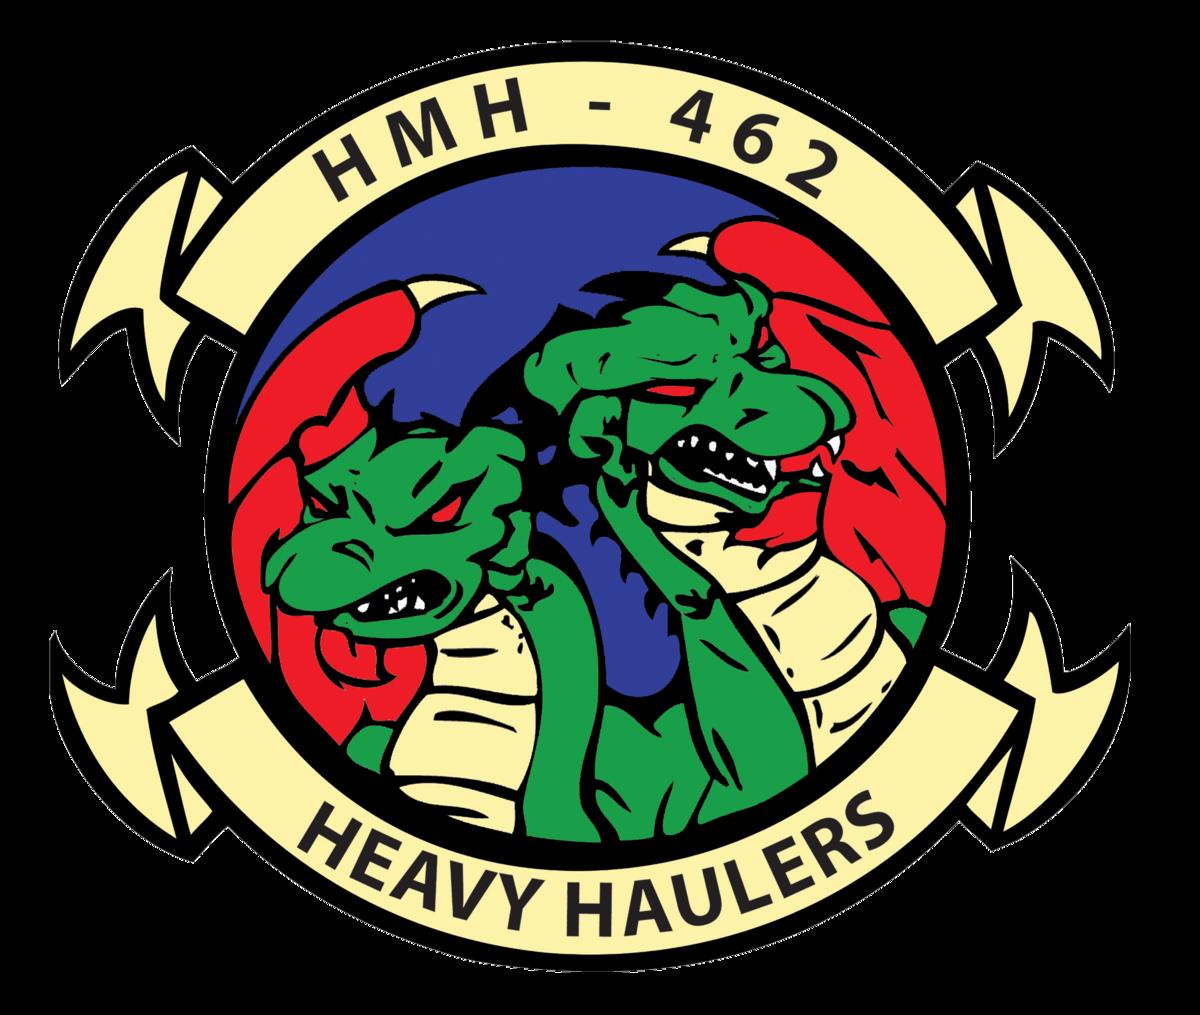 462 >> Hmh 462 Wikipedia